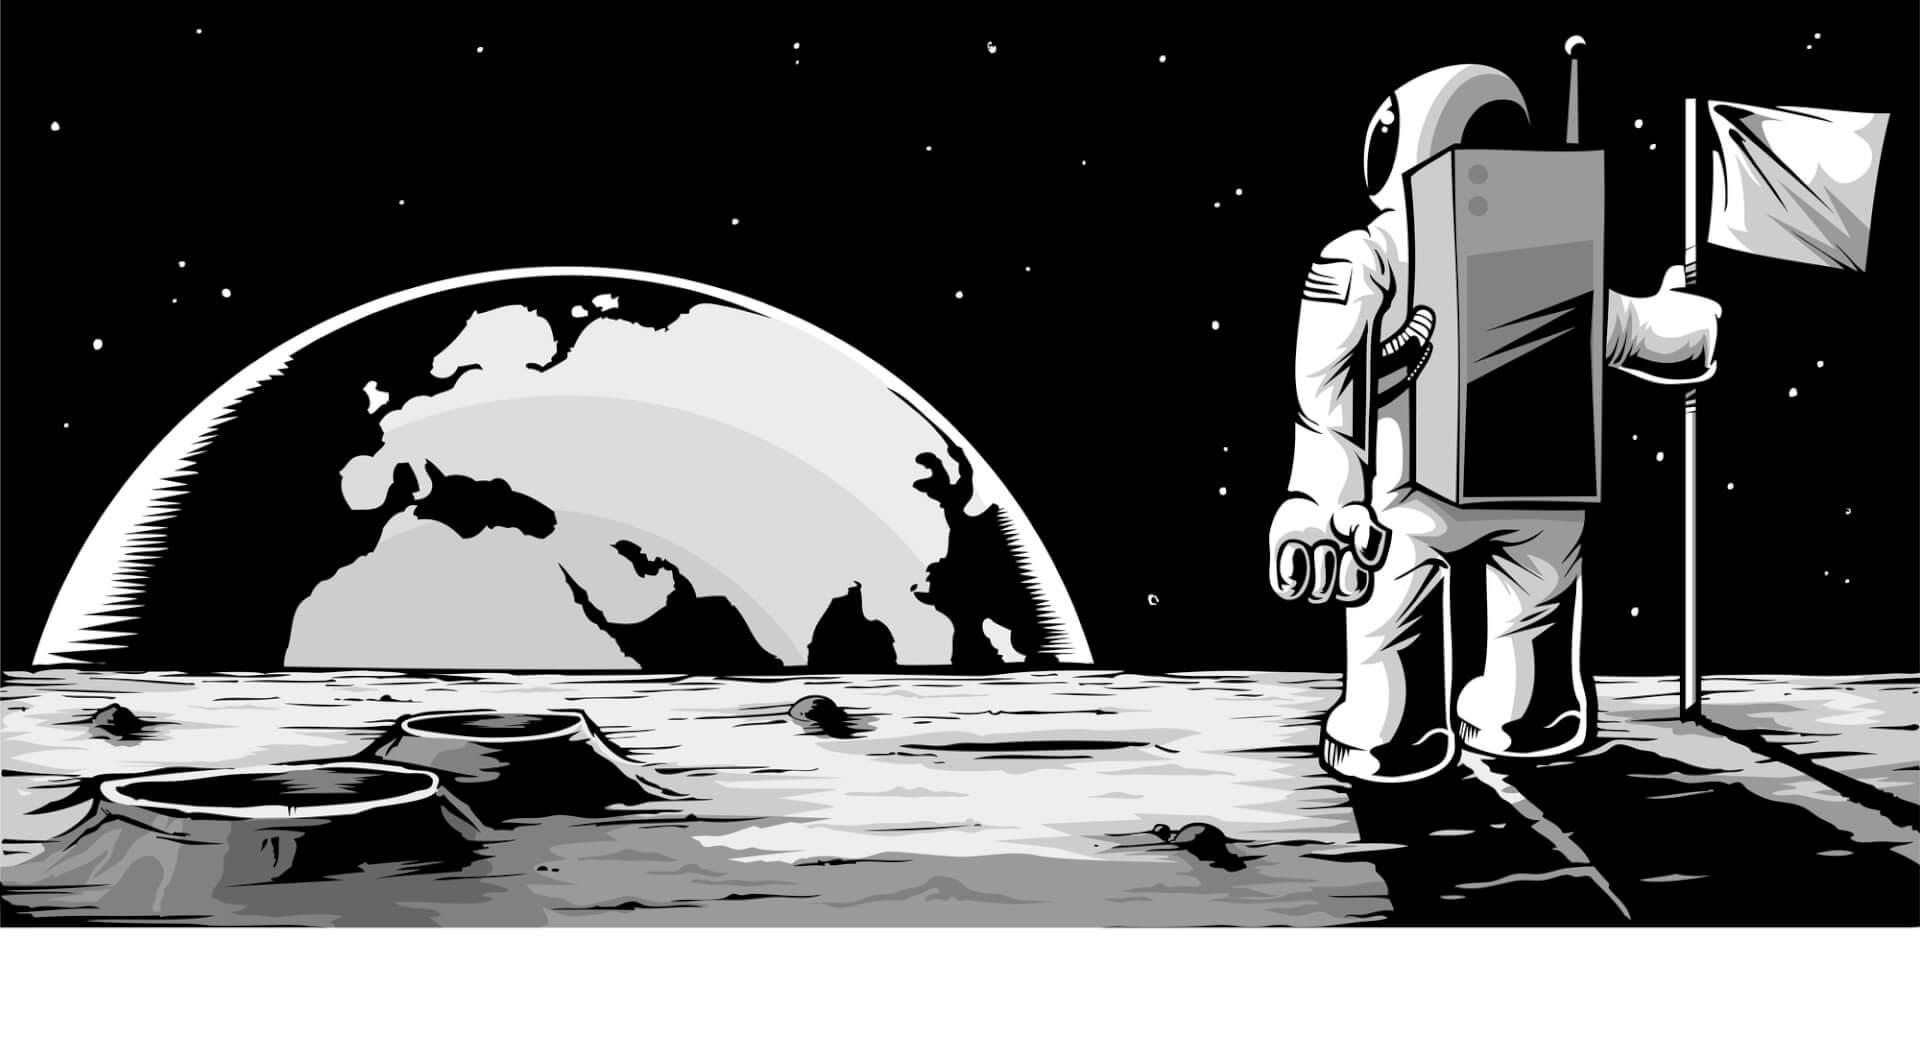 Moon-landing attempts